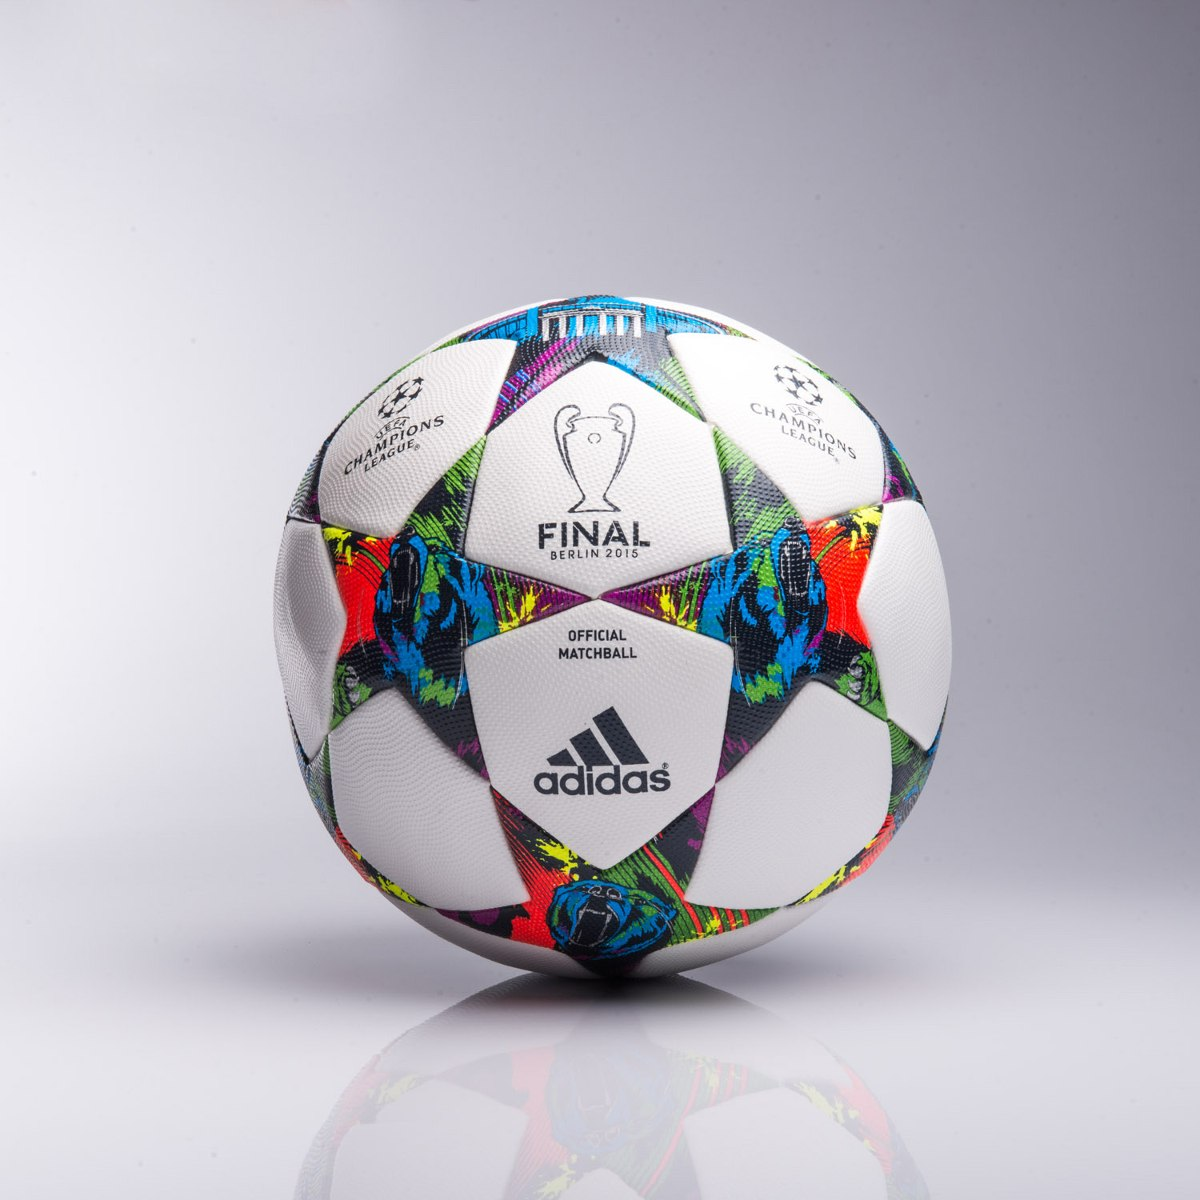 pelota adidas oficial final champions berlin 2015-m36915- op. Cargando zoom. 8ff7b6824fdd8